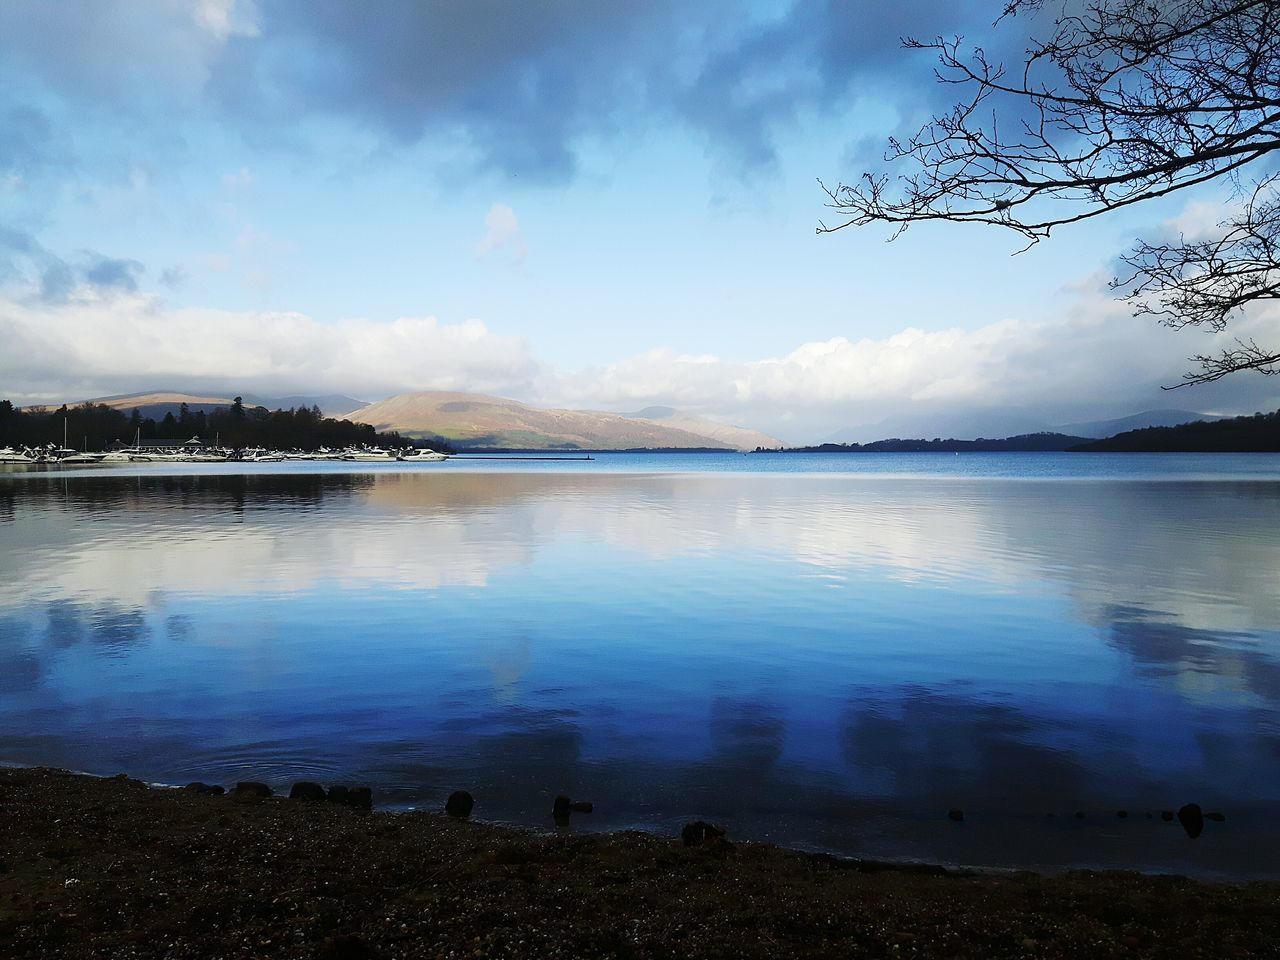 Landscape Reflection Cloud - Sky Horizon Over Water Scenics No People Outdoors LochLomond